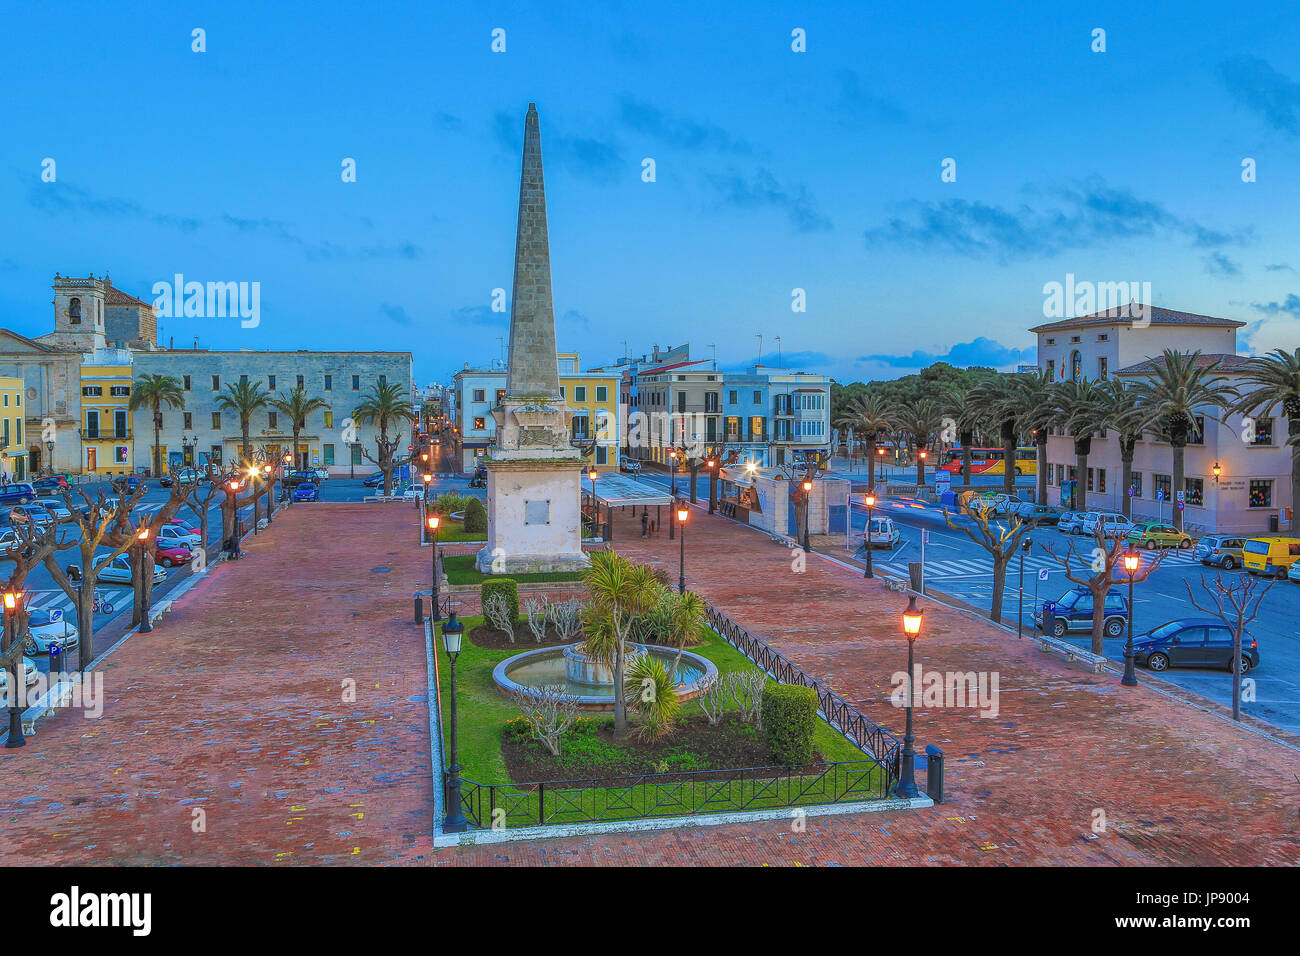 Spain, Balearic Islands, Menorca Island, Ciutadella City, Born Square - Stock Image